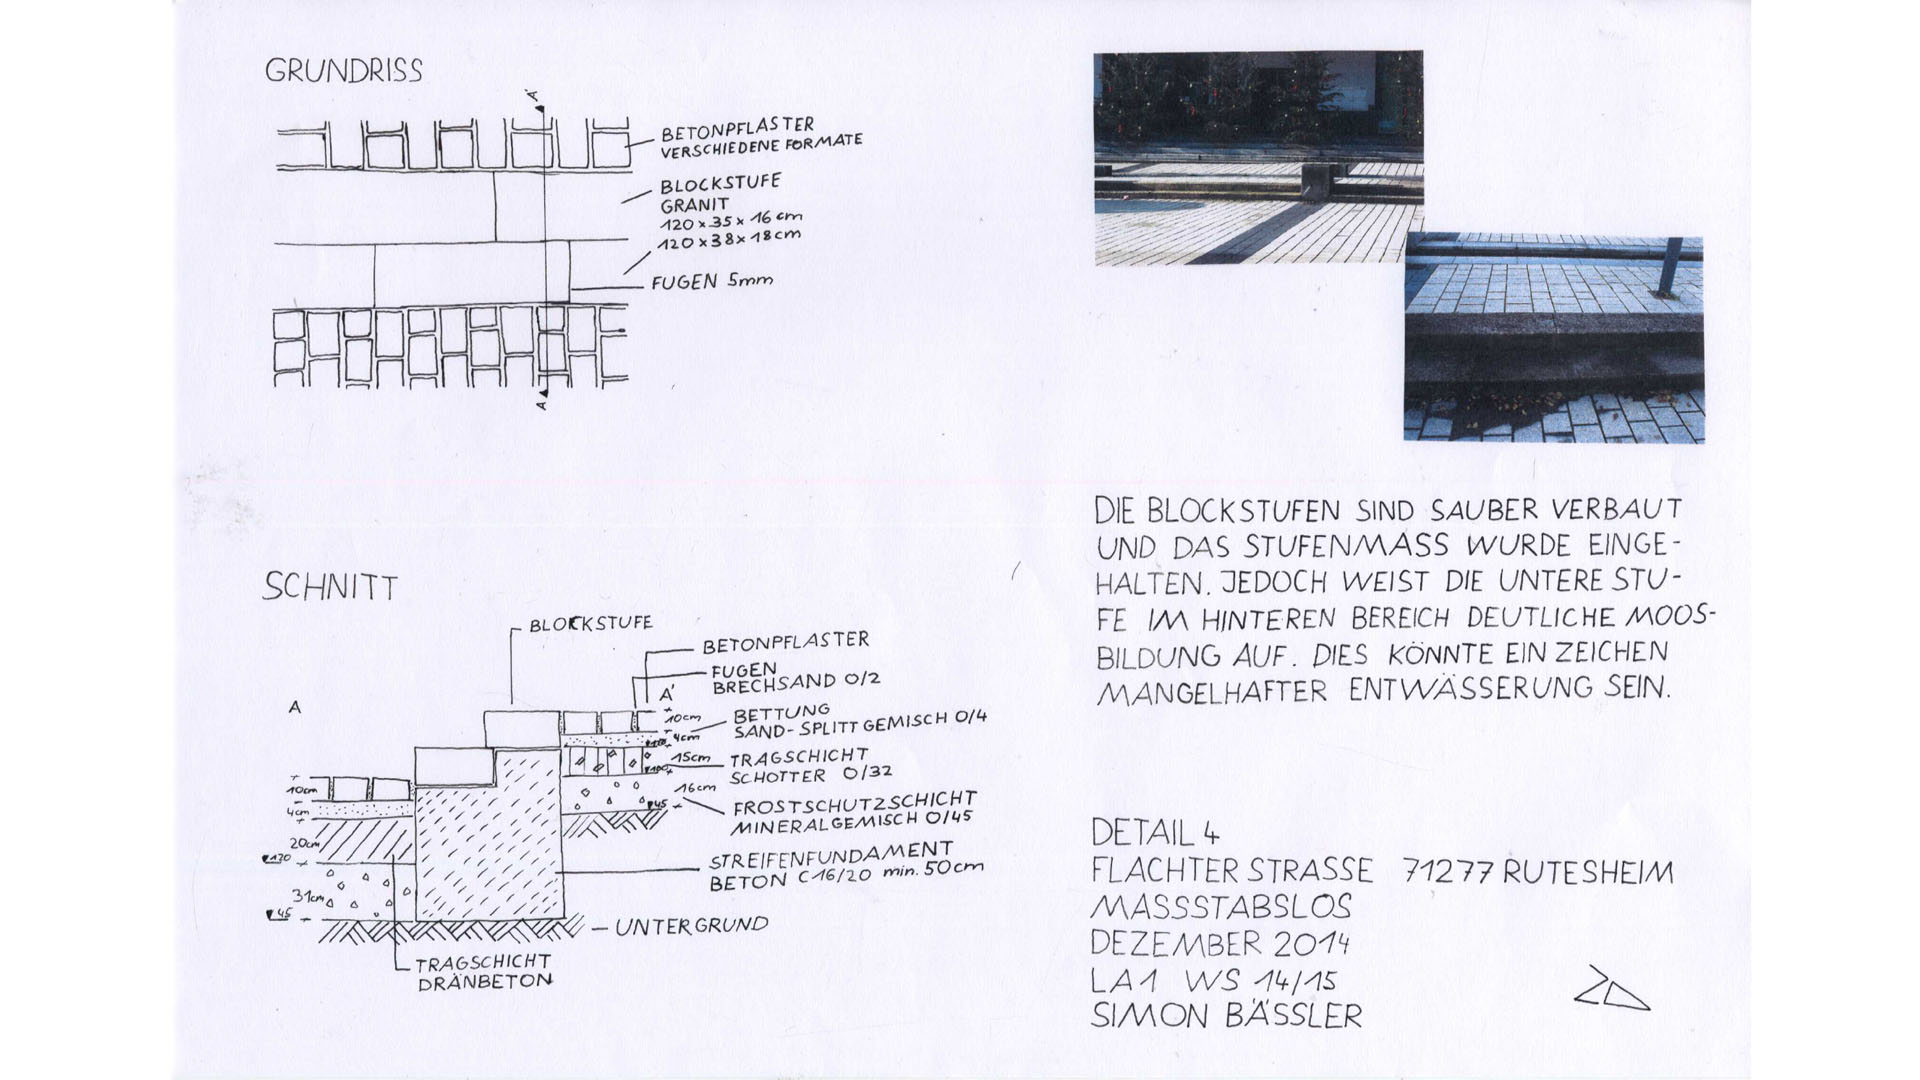 14 1 Baukonstruktion 05